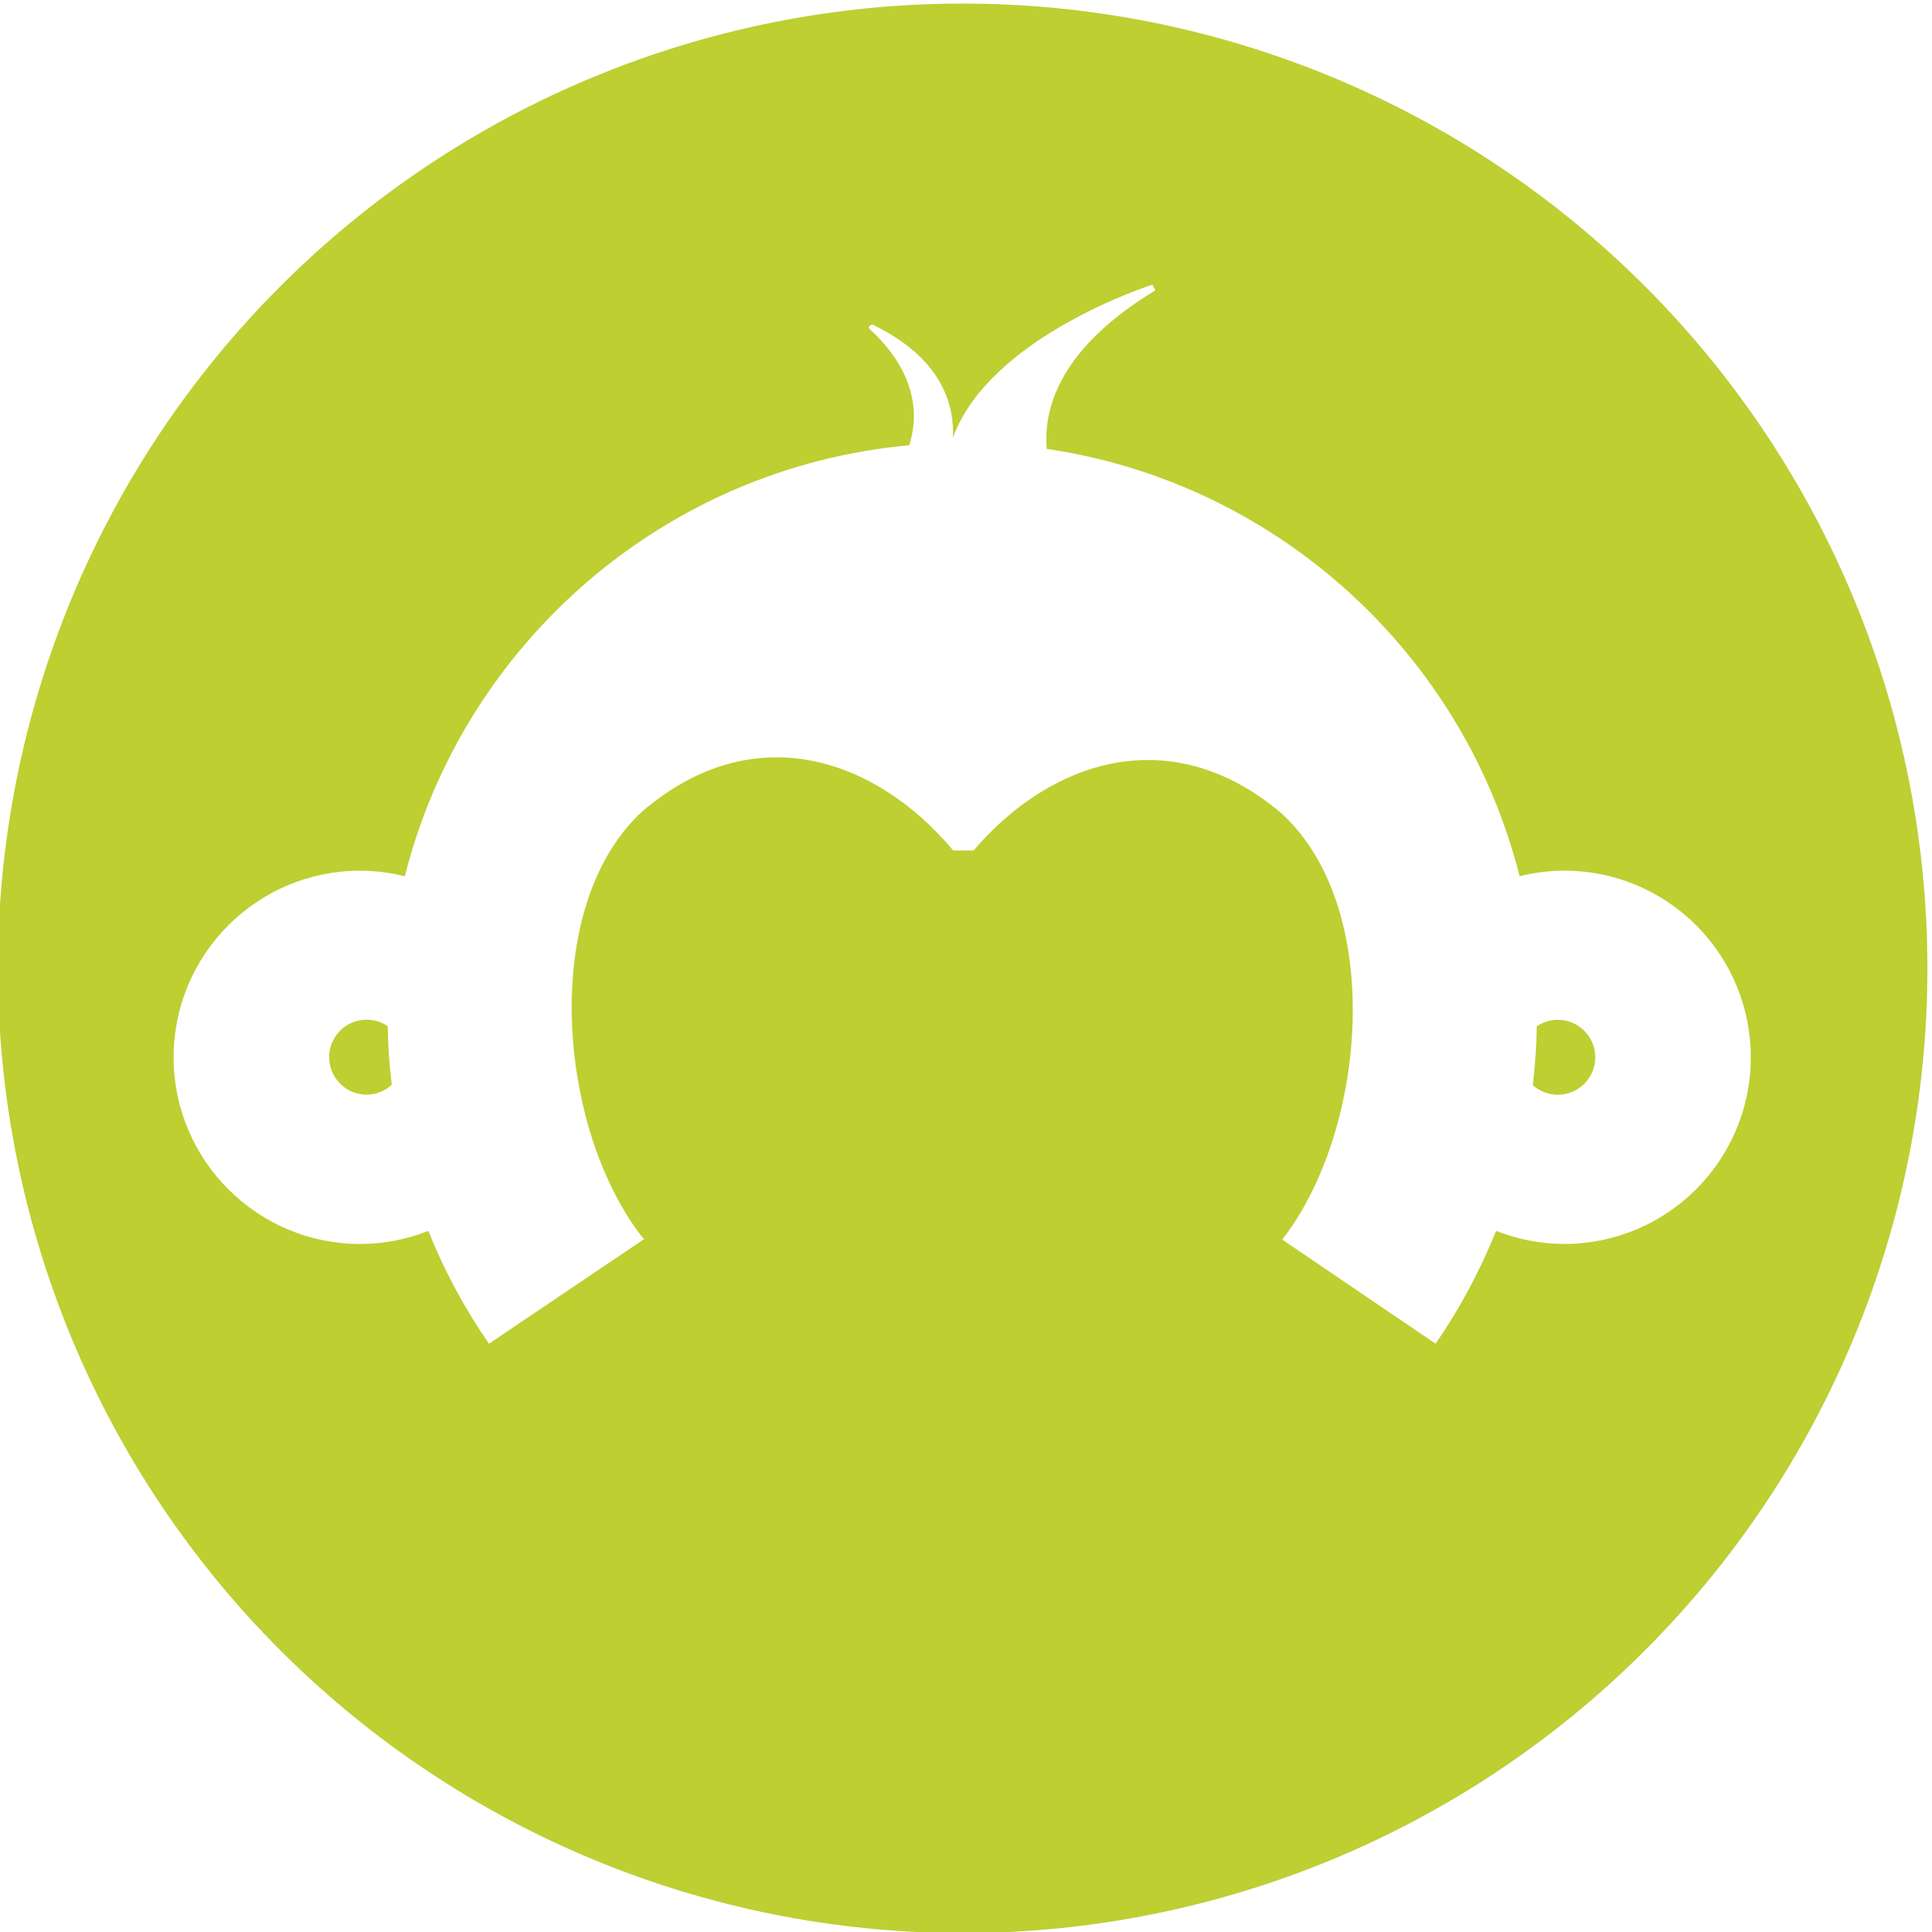 SurveyMonkey icon Logo PNG Transparent & SVG Vector.